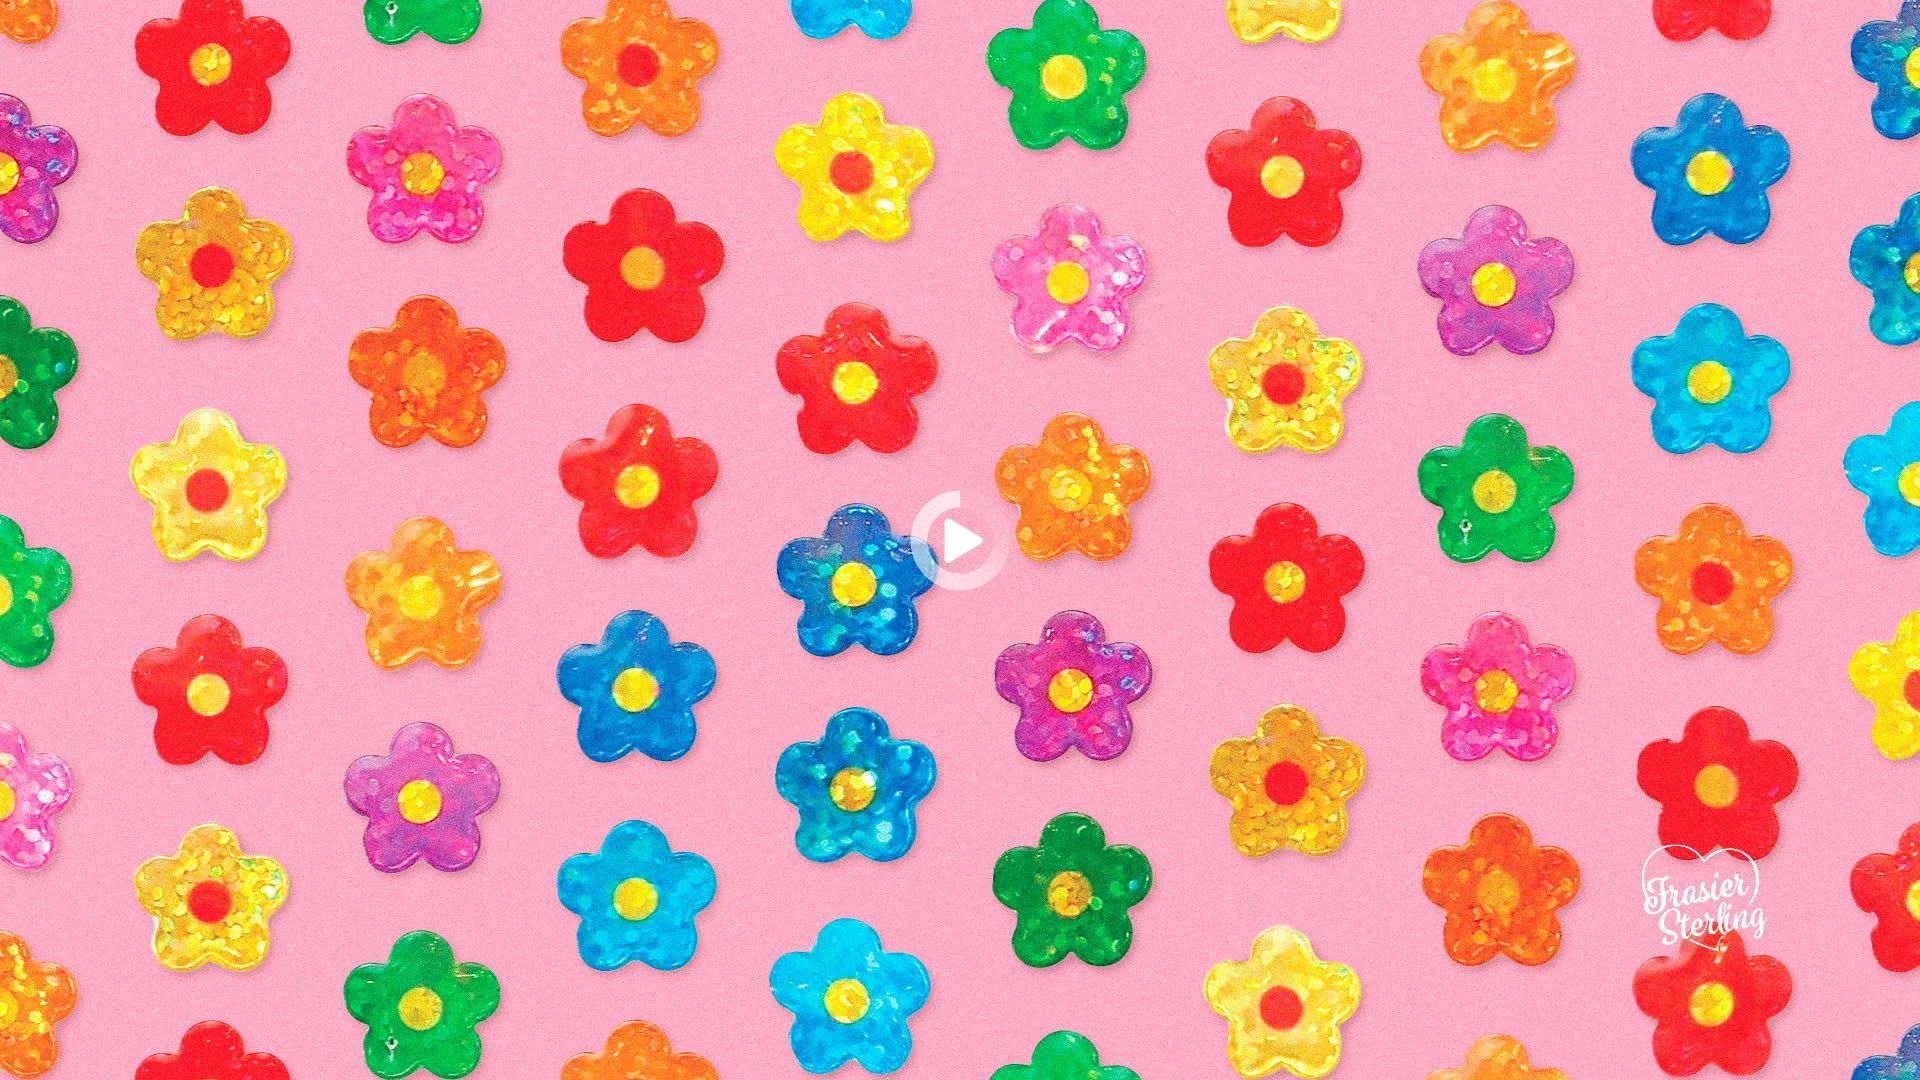 Pin On Bolo Iara Desktop wallpaper indie aesthetic